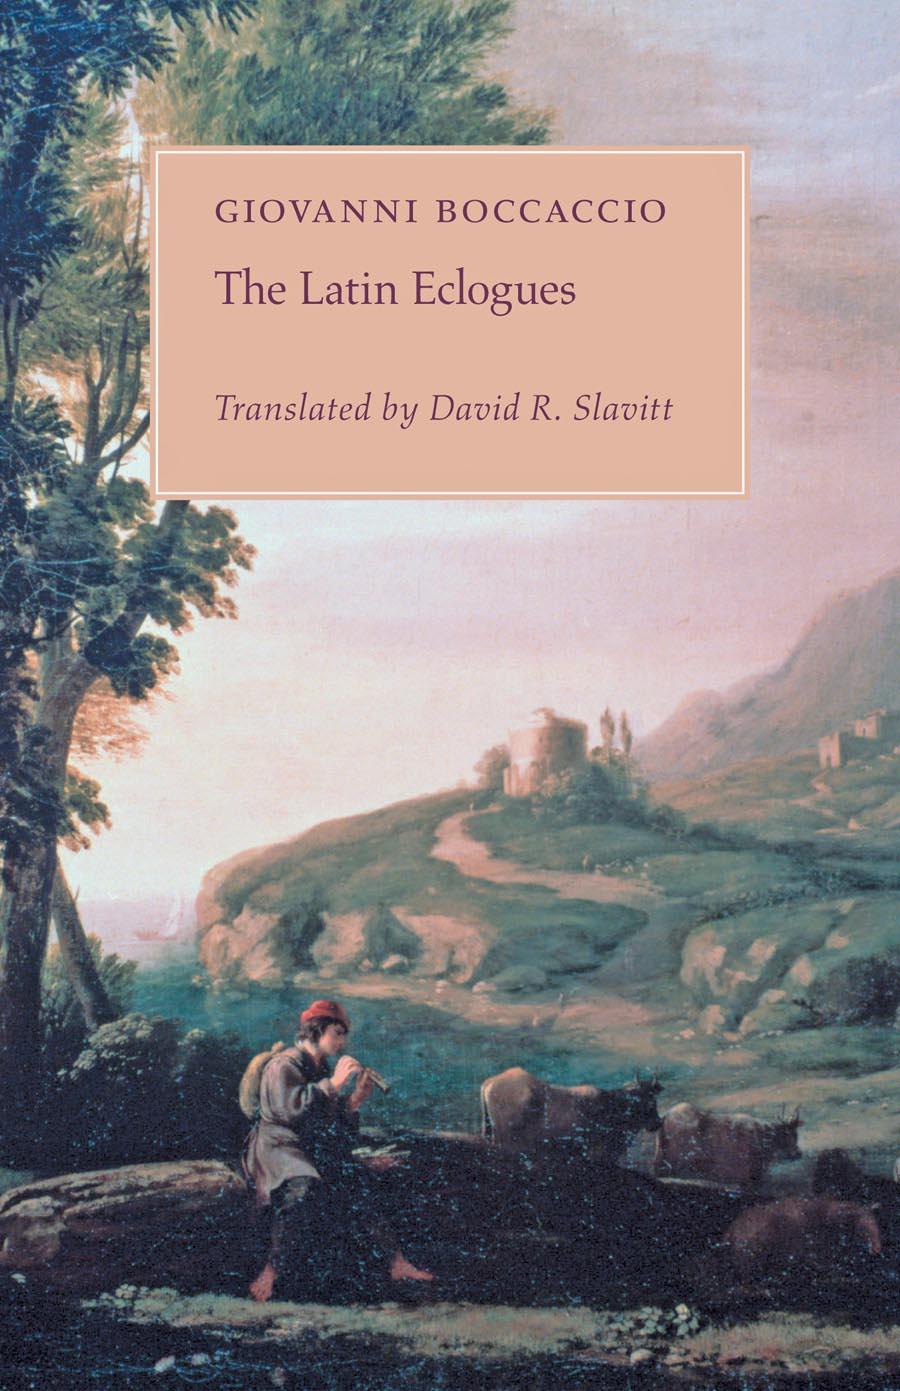 The Latin Eclogues